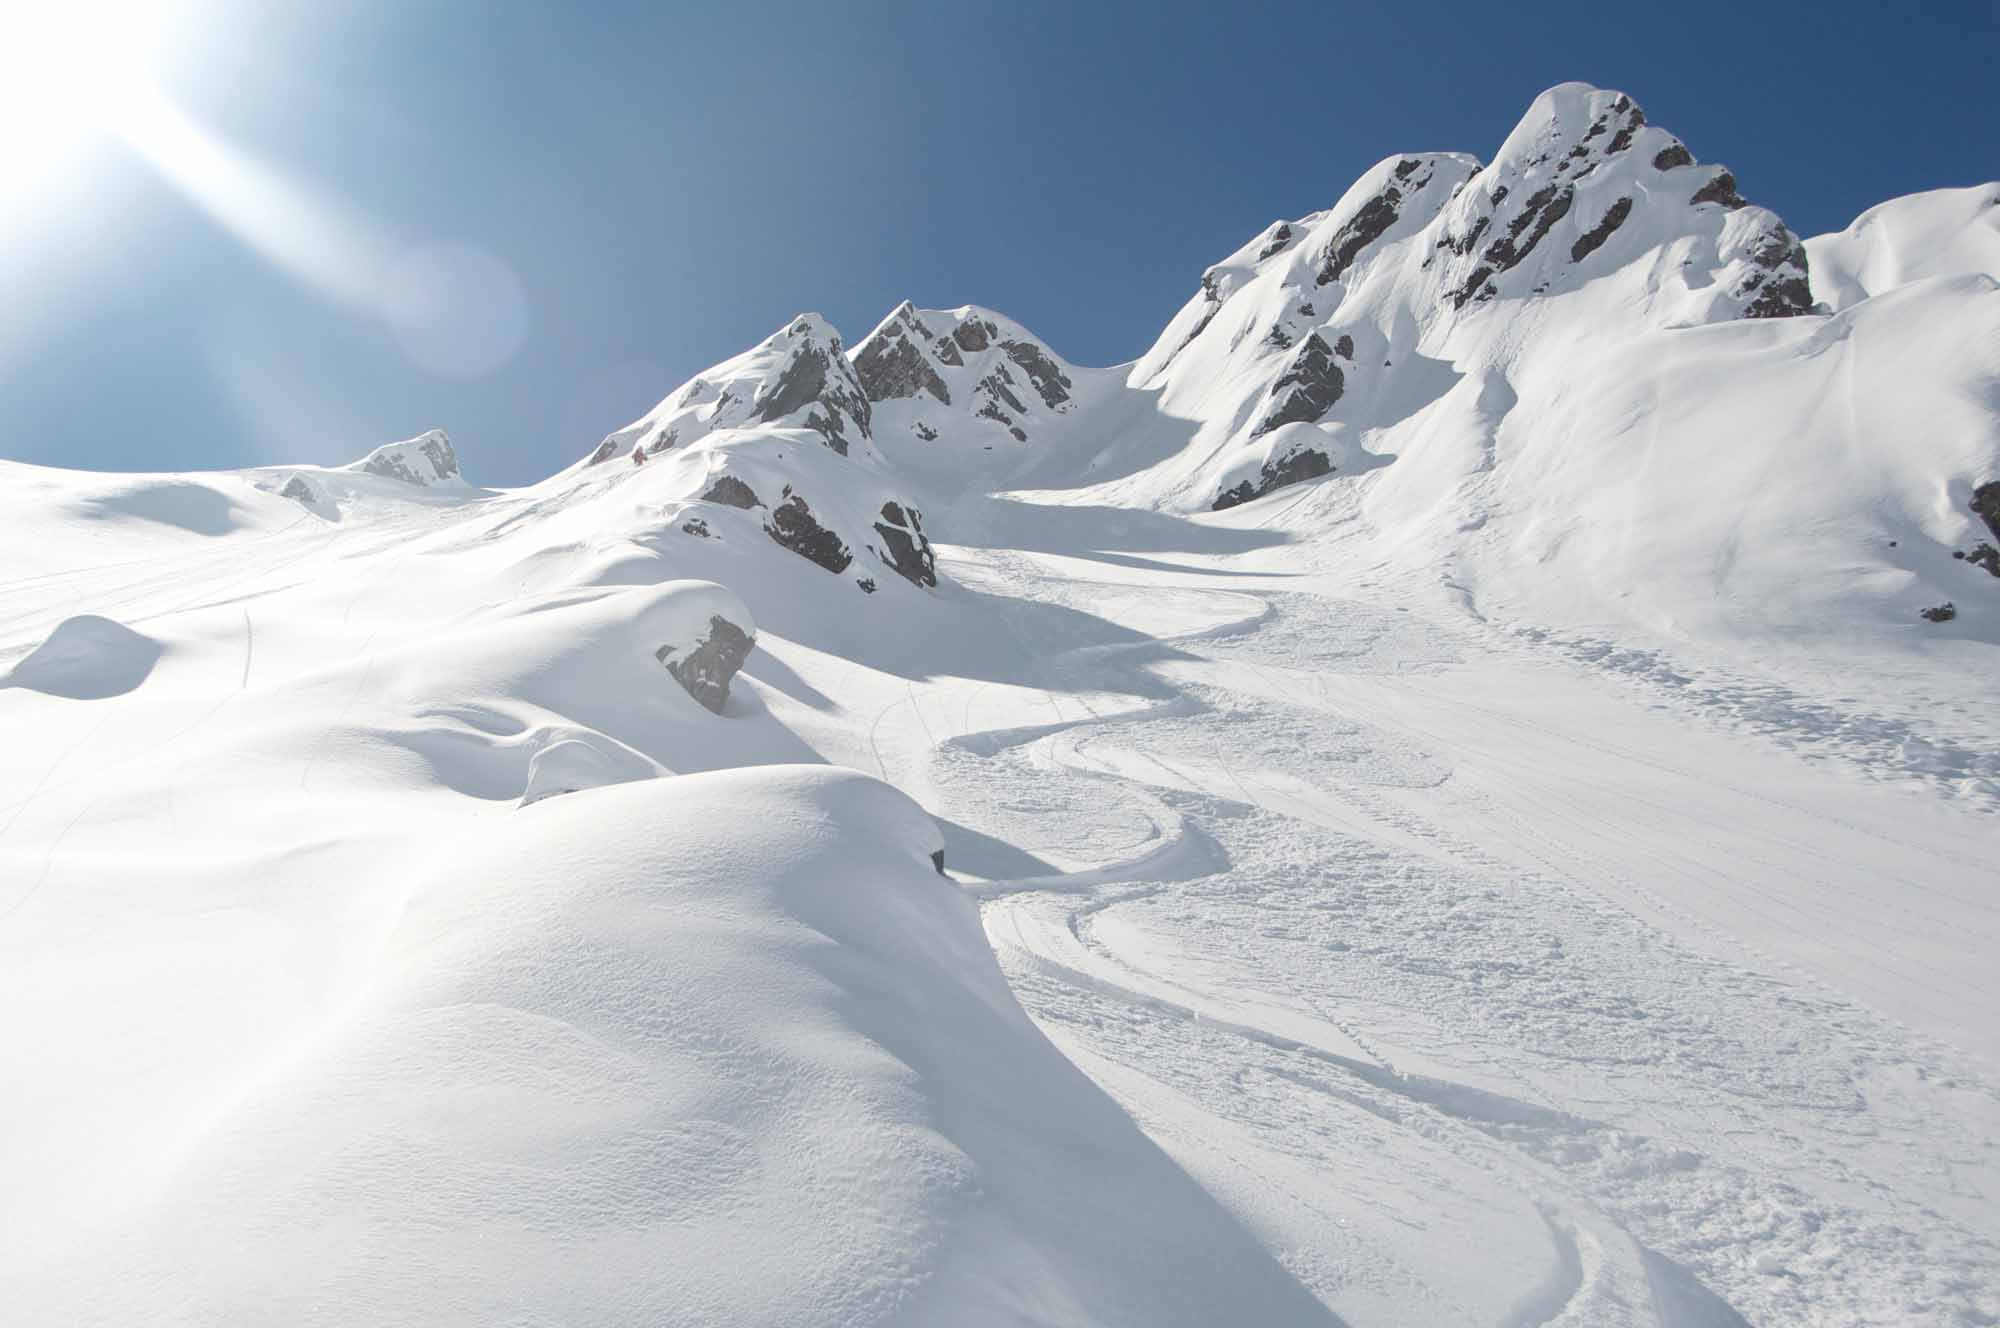 valle-nevado-chile-copy.jpg